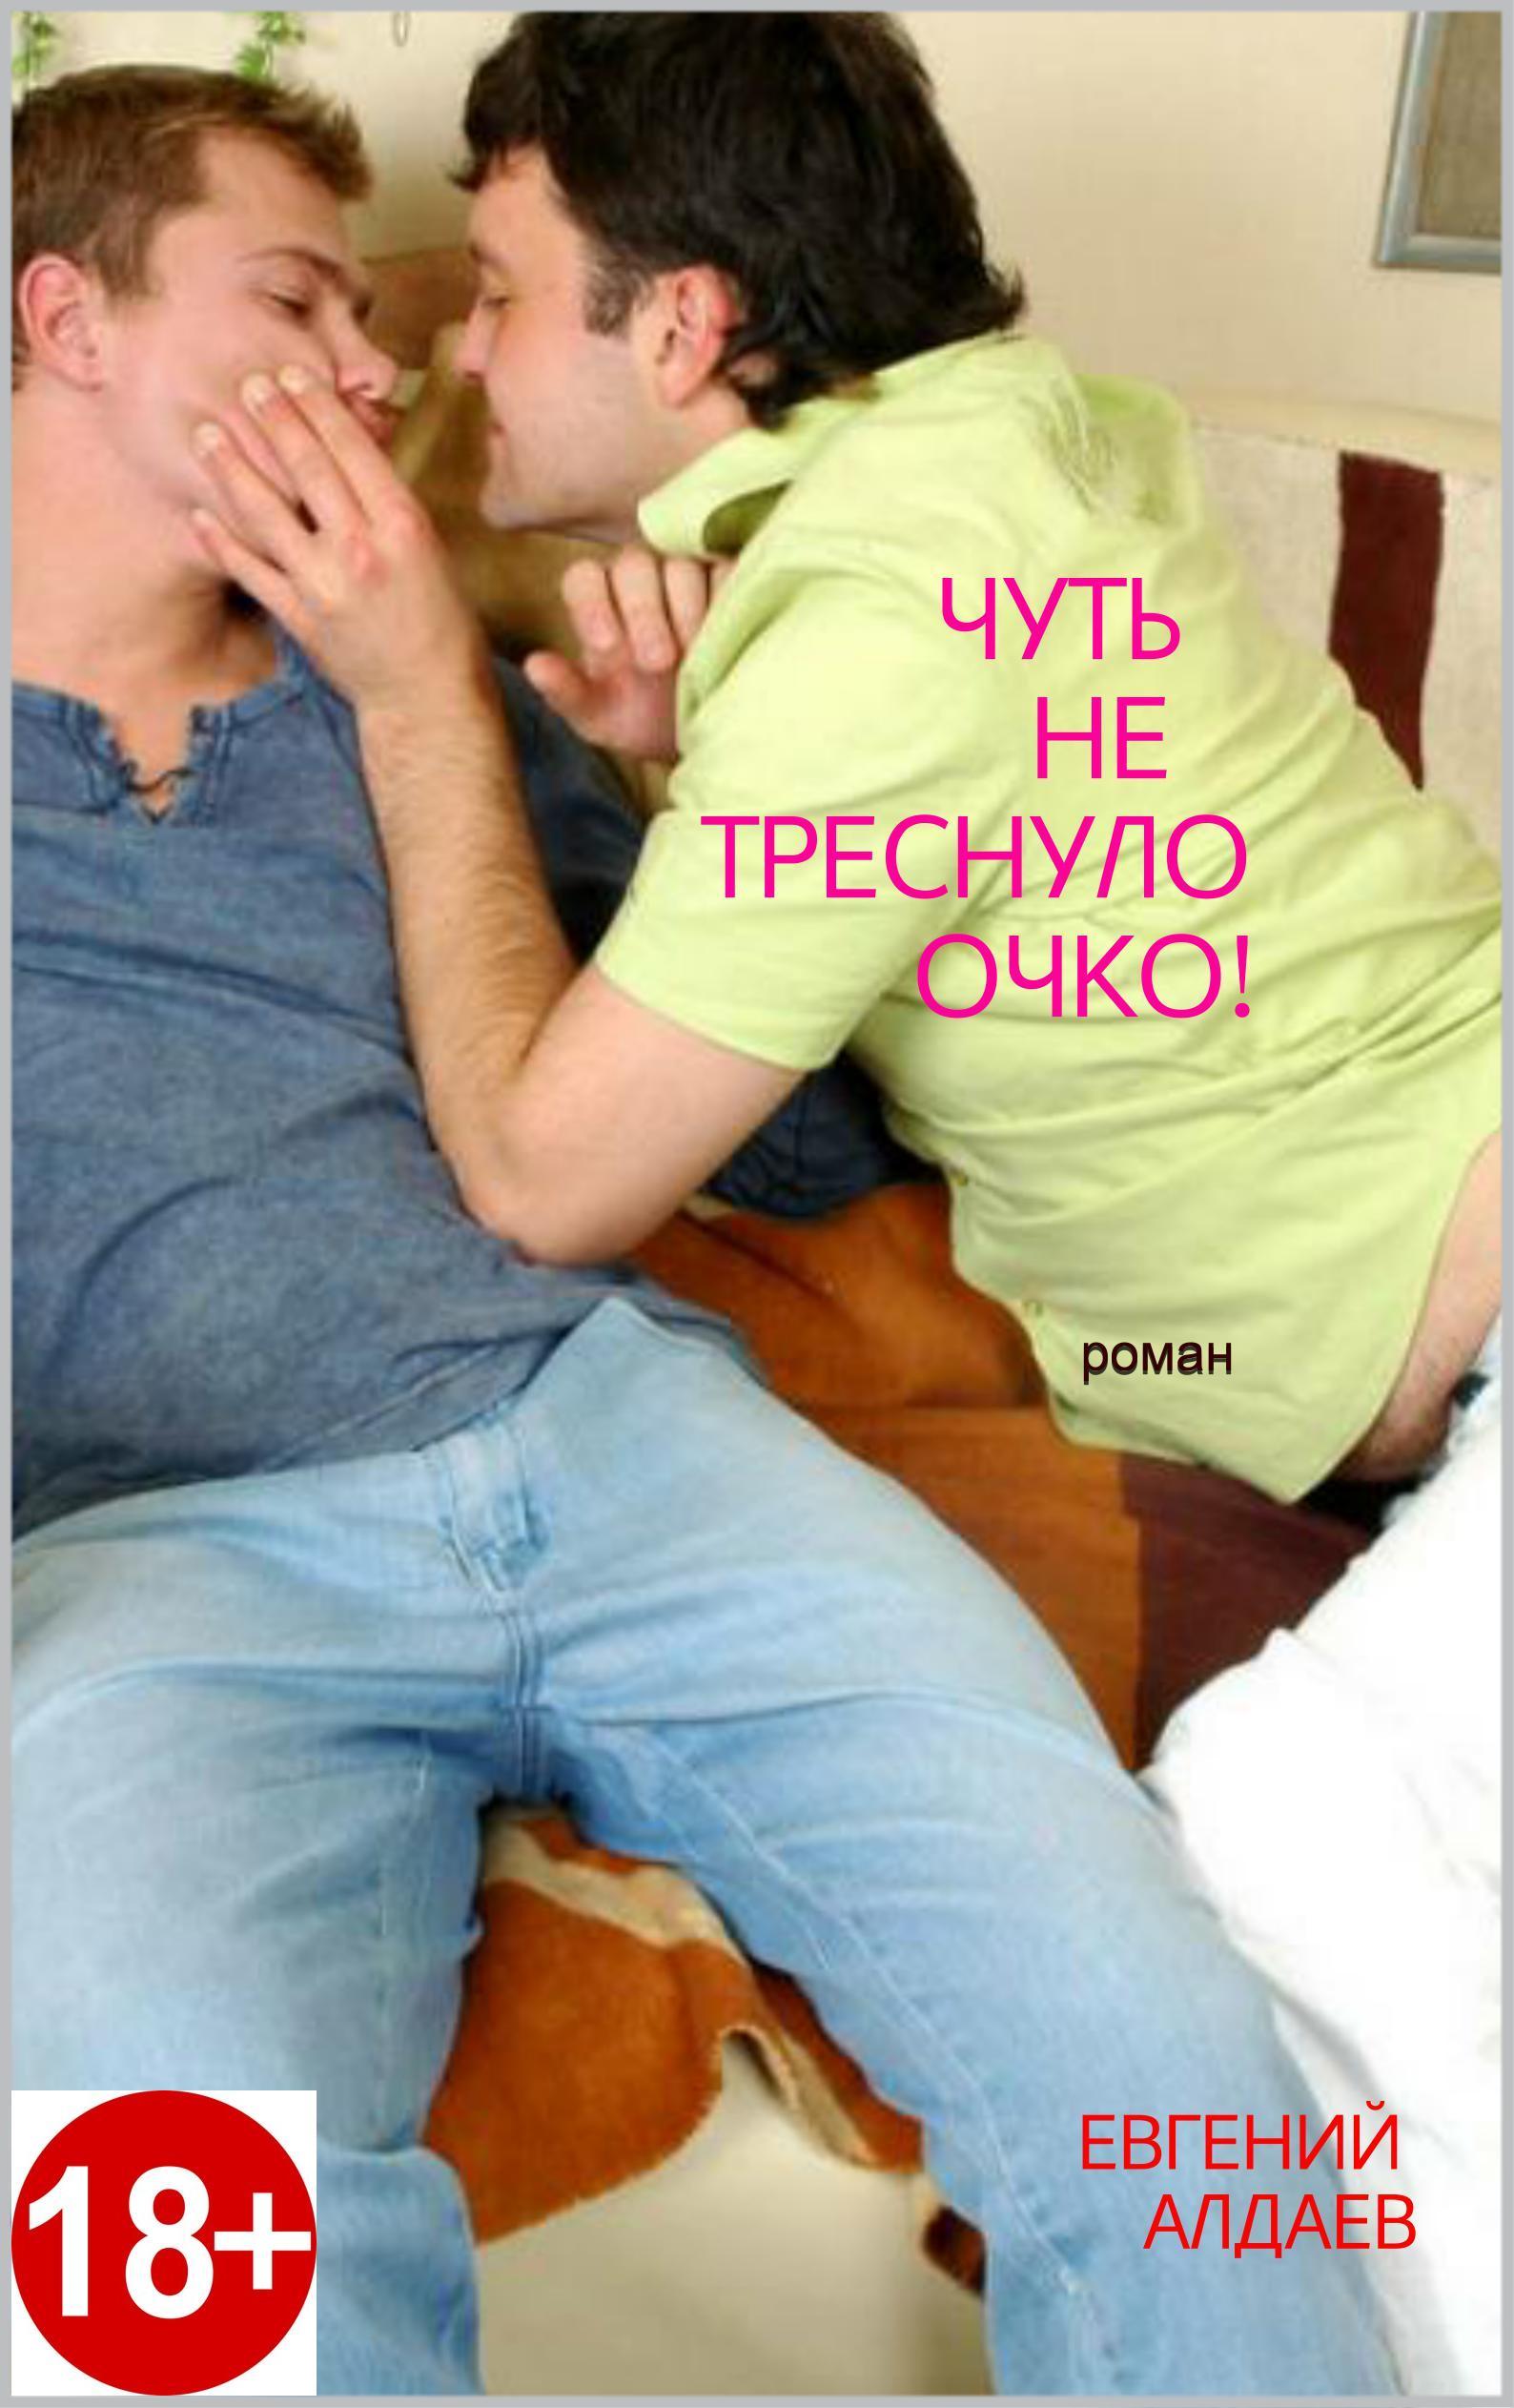 erotika-s-pyanoy-styanuli-trusi-i-poigrali-butilkoy